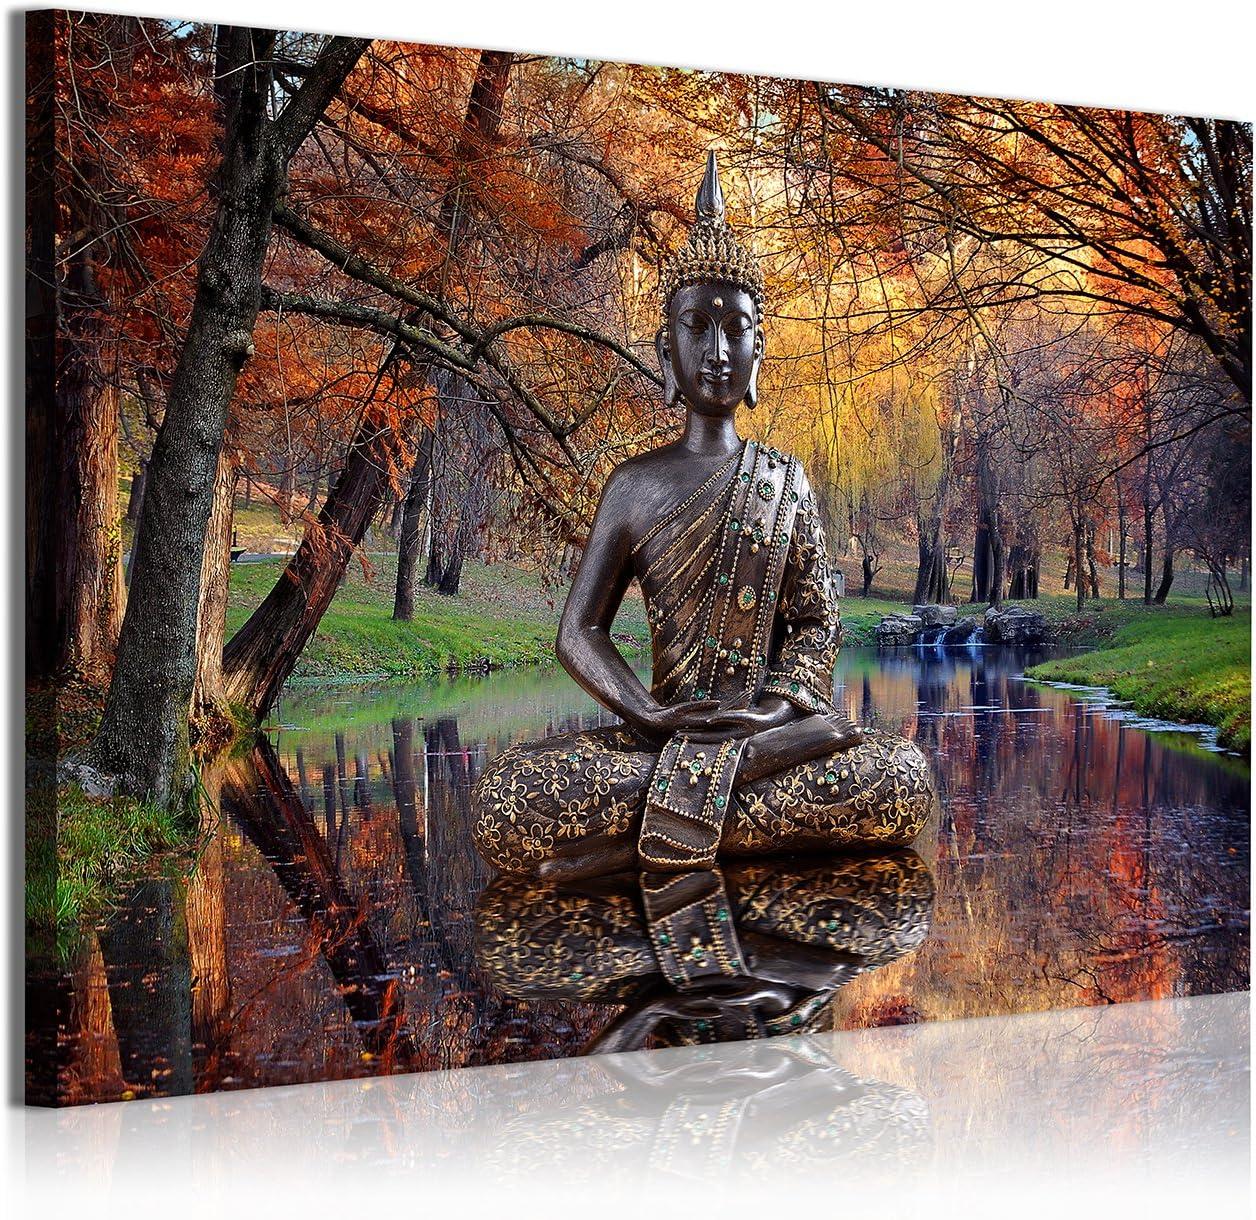 DekoArte Cuadros Modernos Impresión de Imagen Artística Digitalizada, Lienzo Decorativo para Tu Salón o Dormitorio, Estilo Buda Zen en Lago Paisaje Relajación Naturaleza, ocres, 1 Pieza (120x80x3cm)